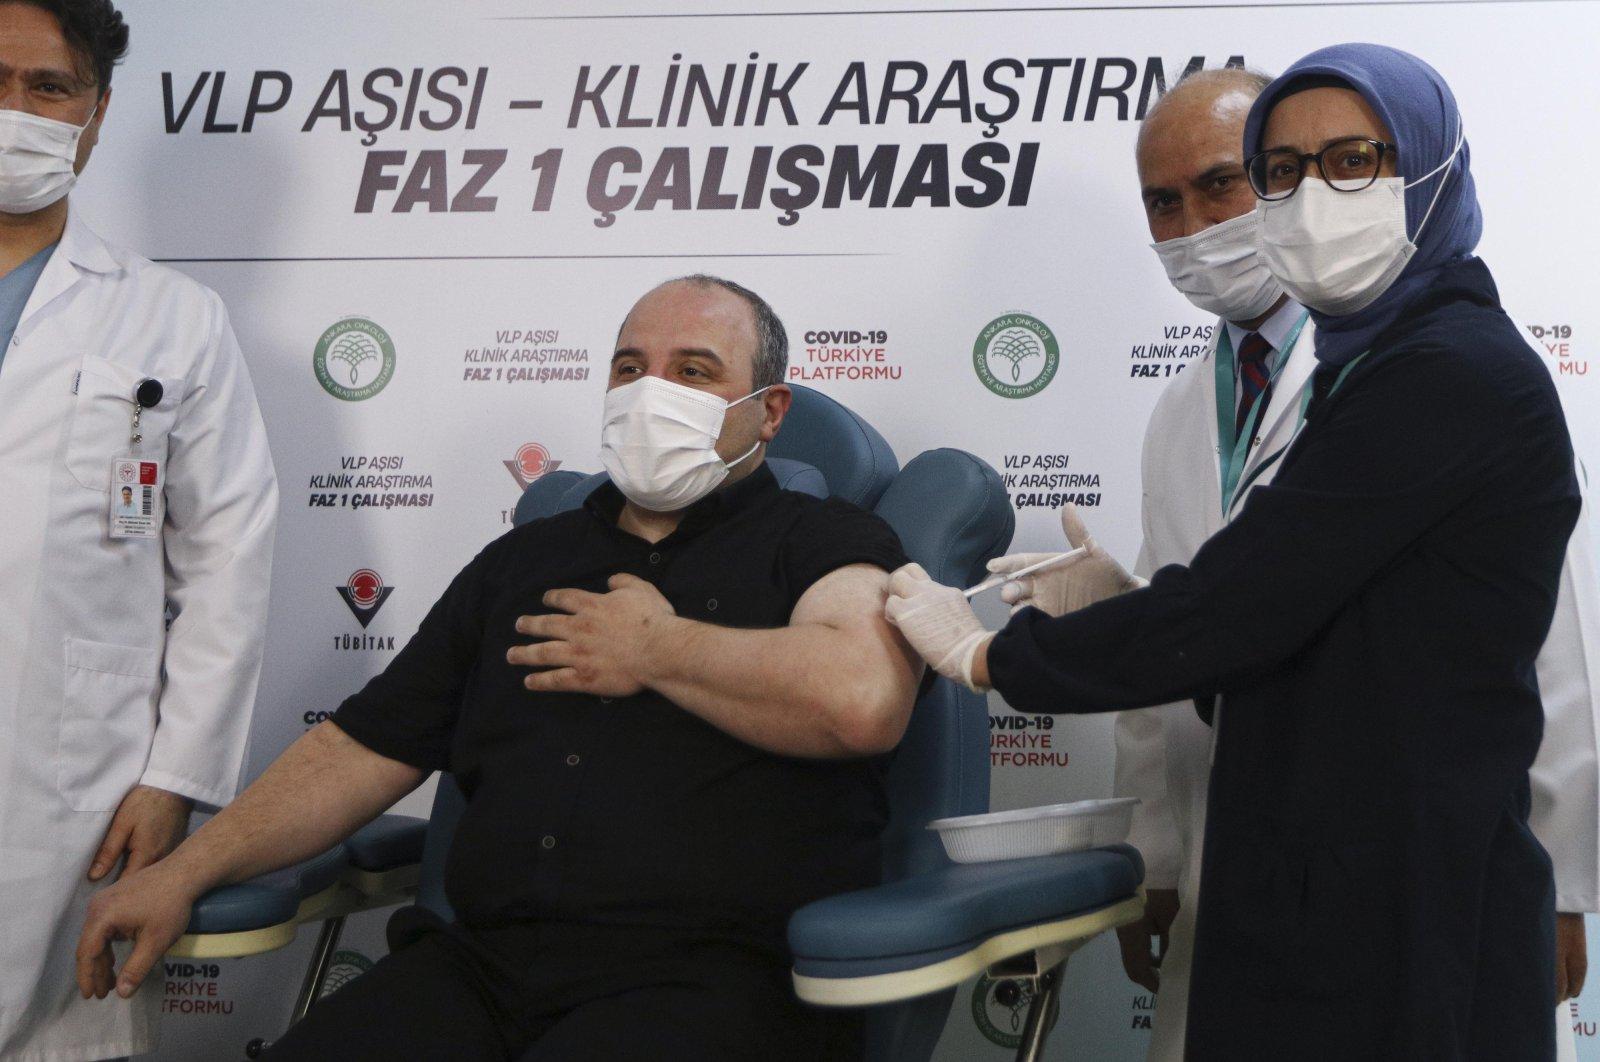 Industry and Technology Minister Mustafa Varank receives the VLP-based coronavirus jab at the Ankara Oncology Hospital, Ankara, Turkey, April 17, 2021. (DHA Photo)